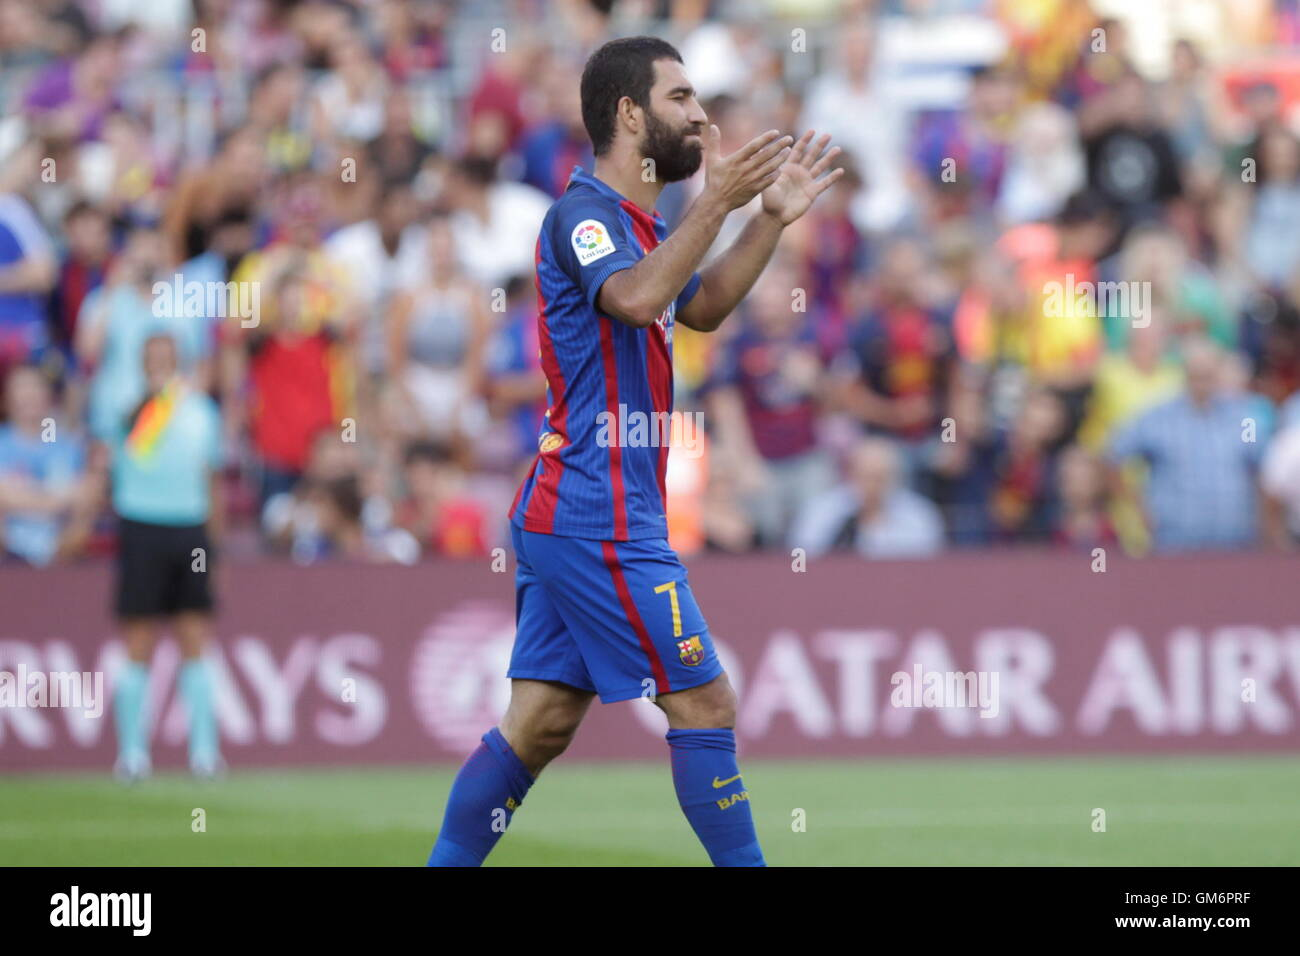 08/20/2016. Camp Nou, Barcelona, Spain. Arda Turan  in action during the Spanish liga match FC Barcelona - betis - Stock Image